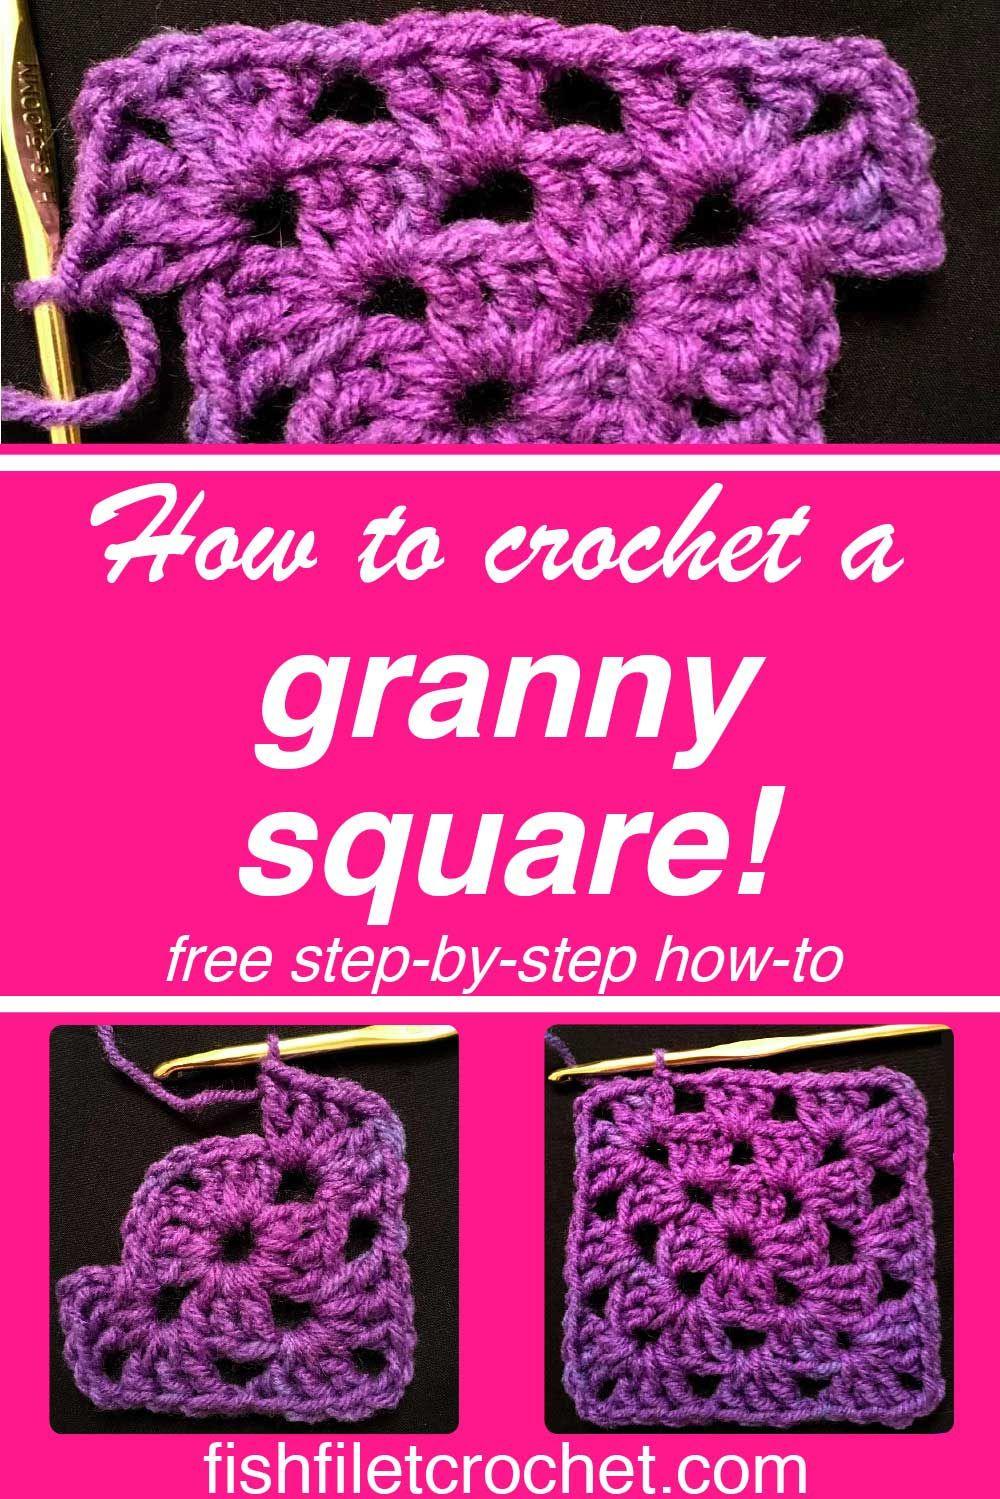 How To Crochet A Granny Square Crochet Knit Crosspoint Crochet